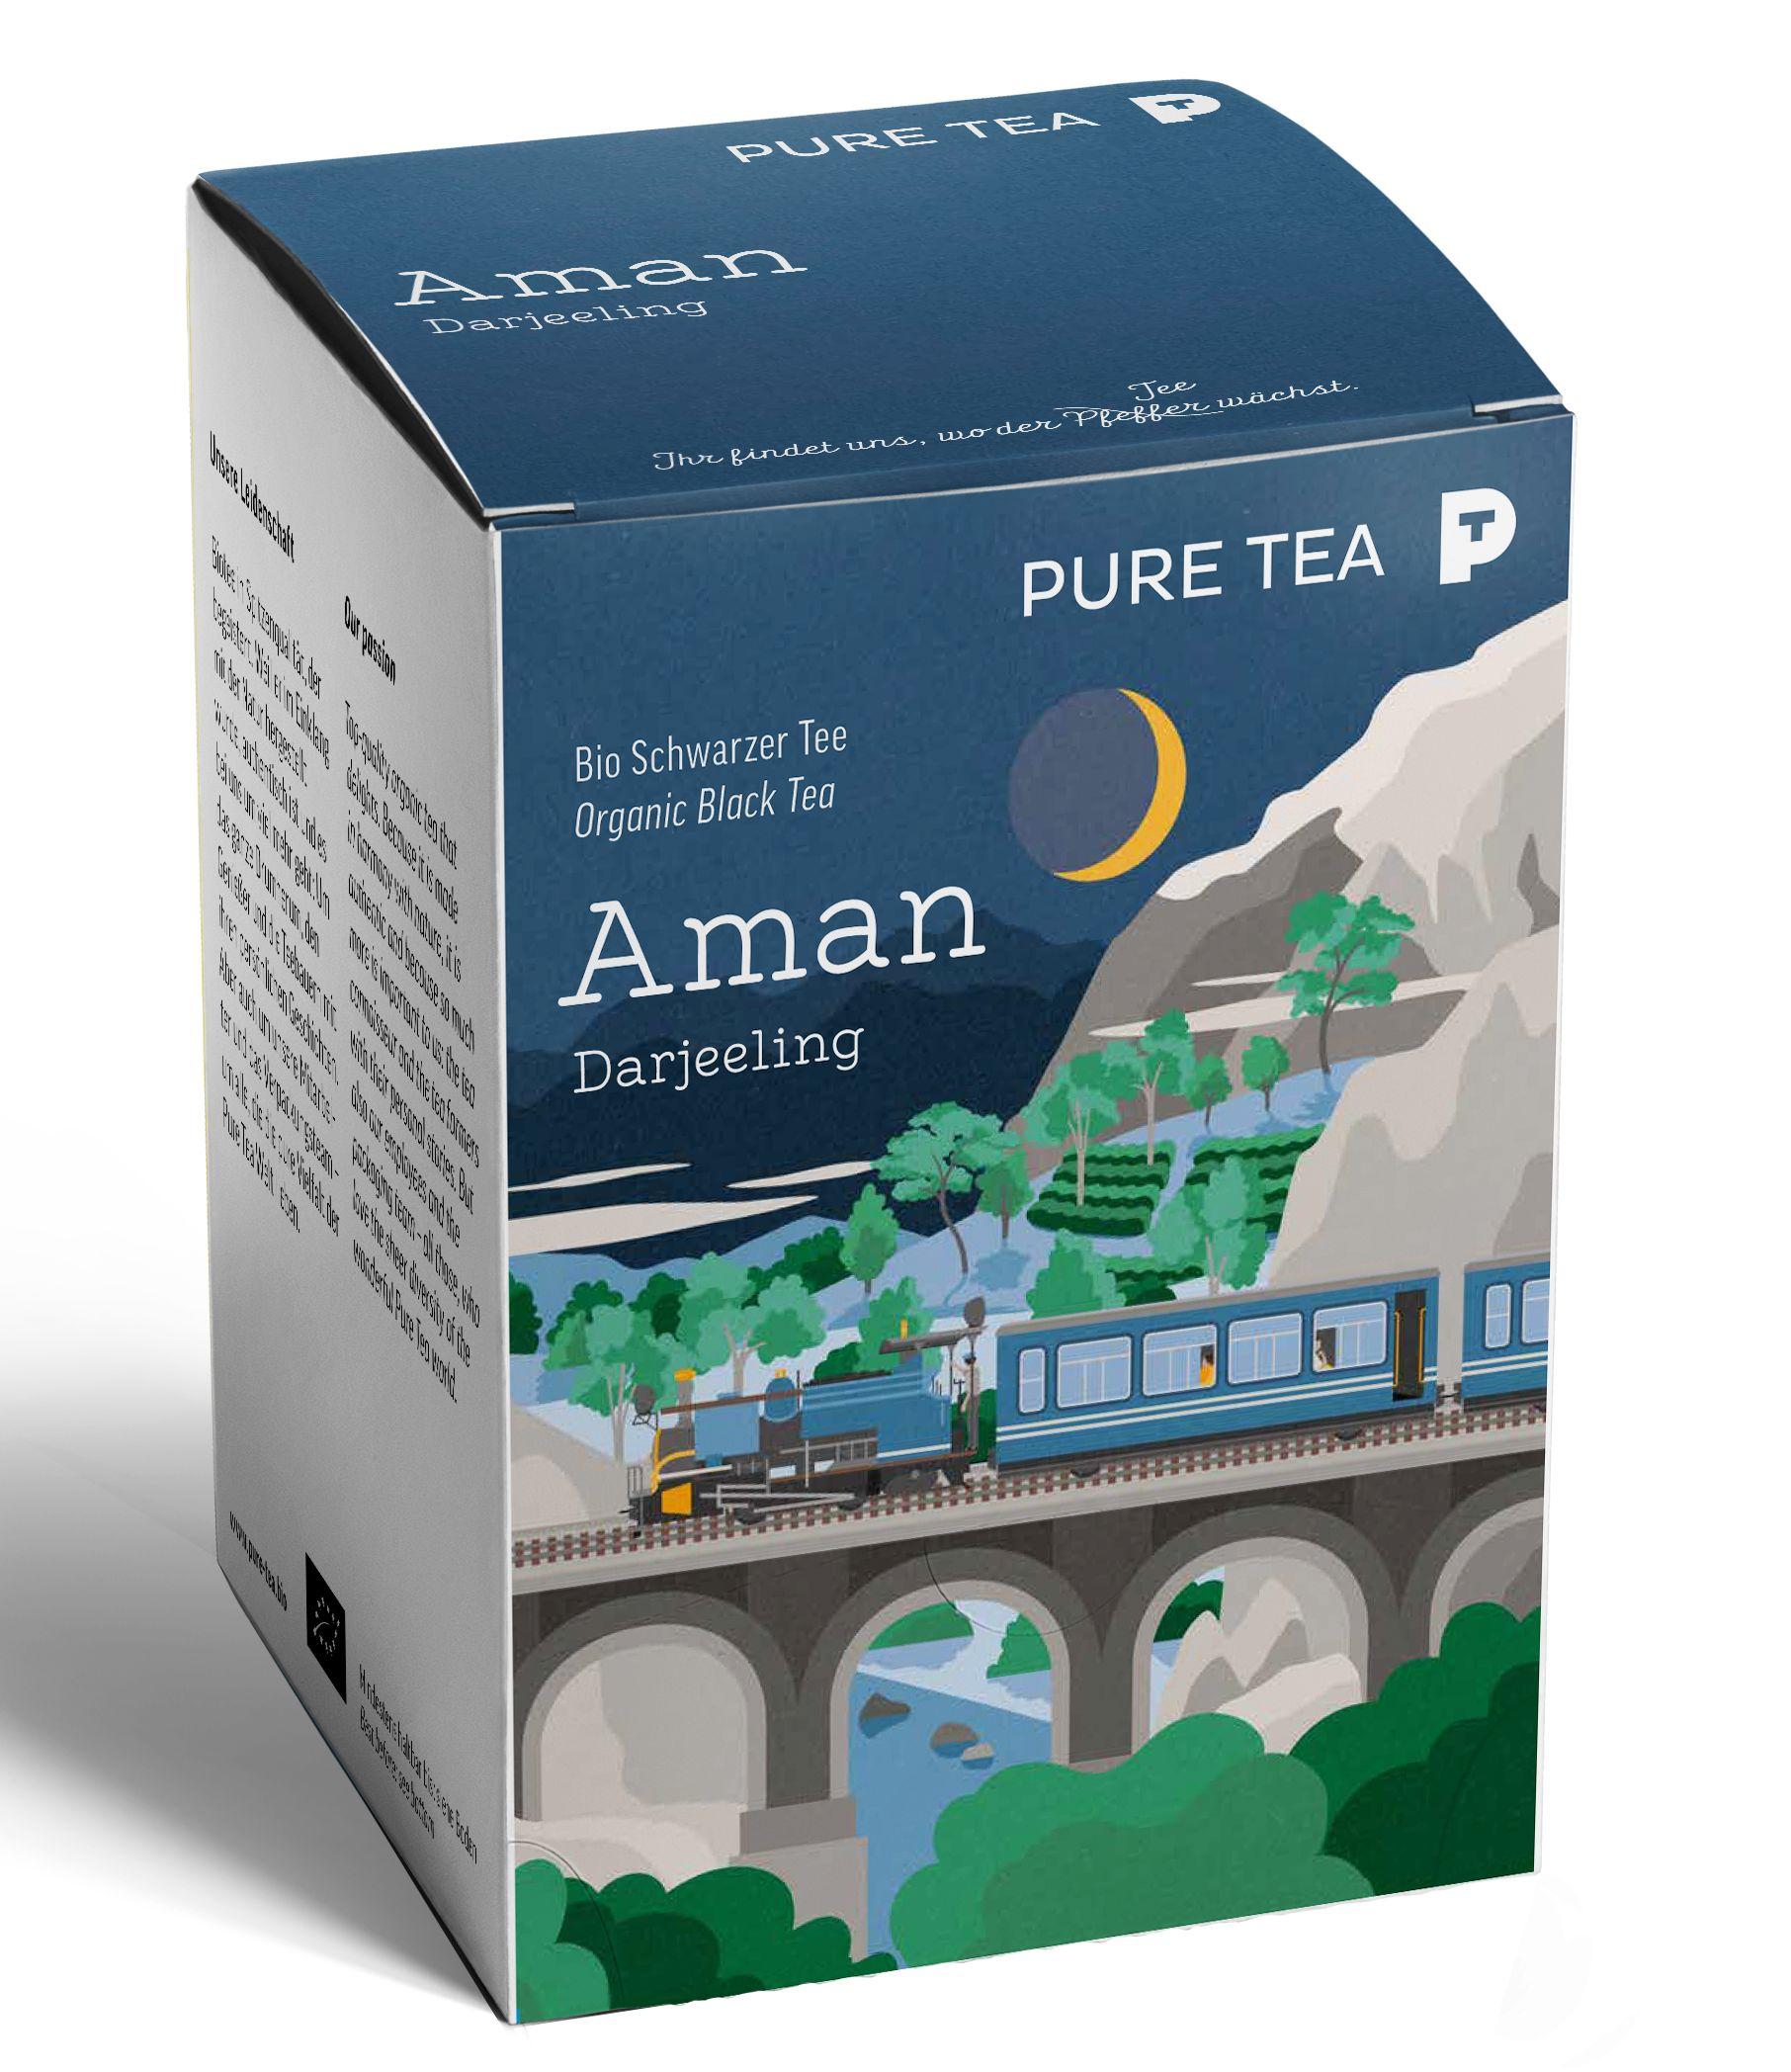 Bio Puretea Pyra Darjeeling Aman